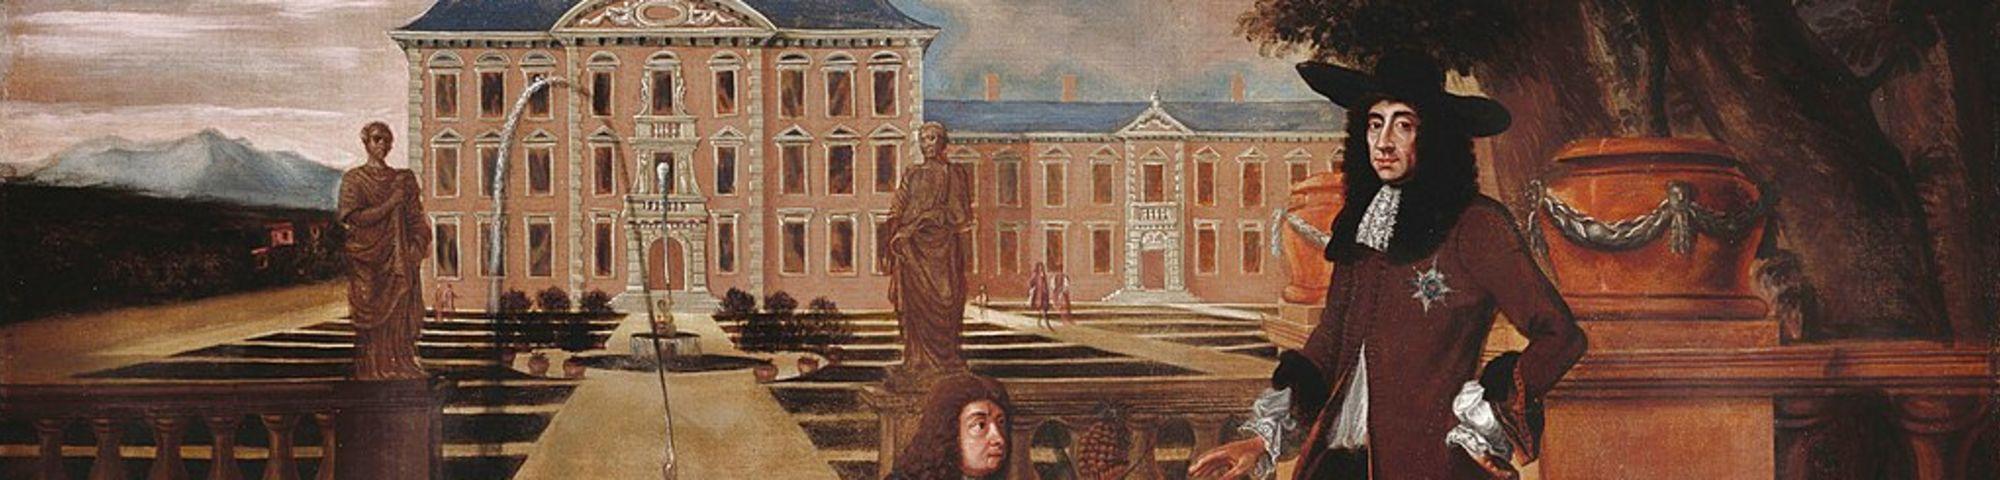 Historical image of Charles II